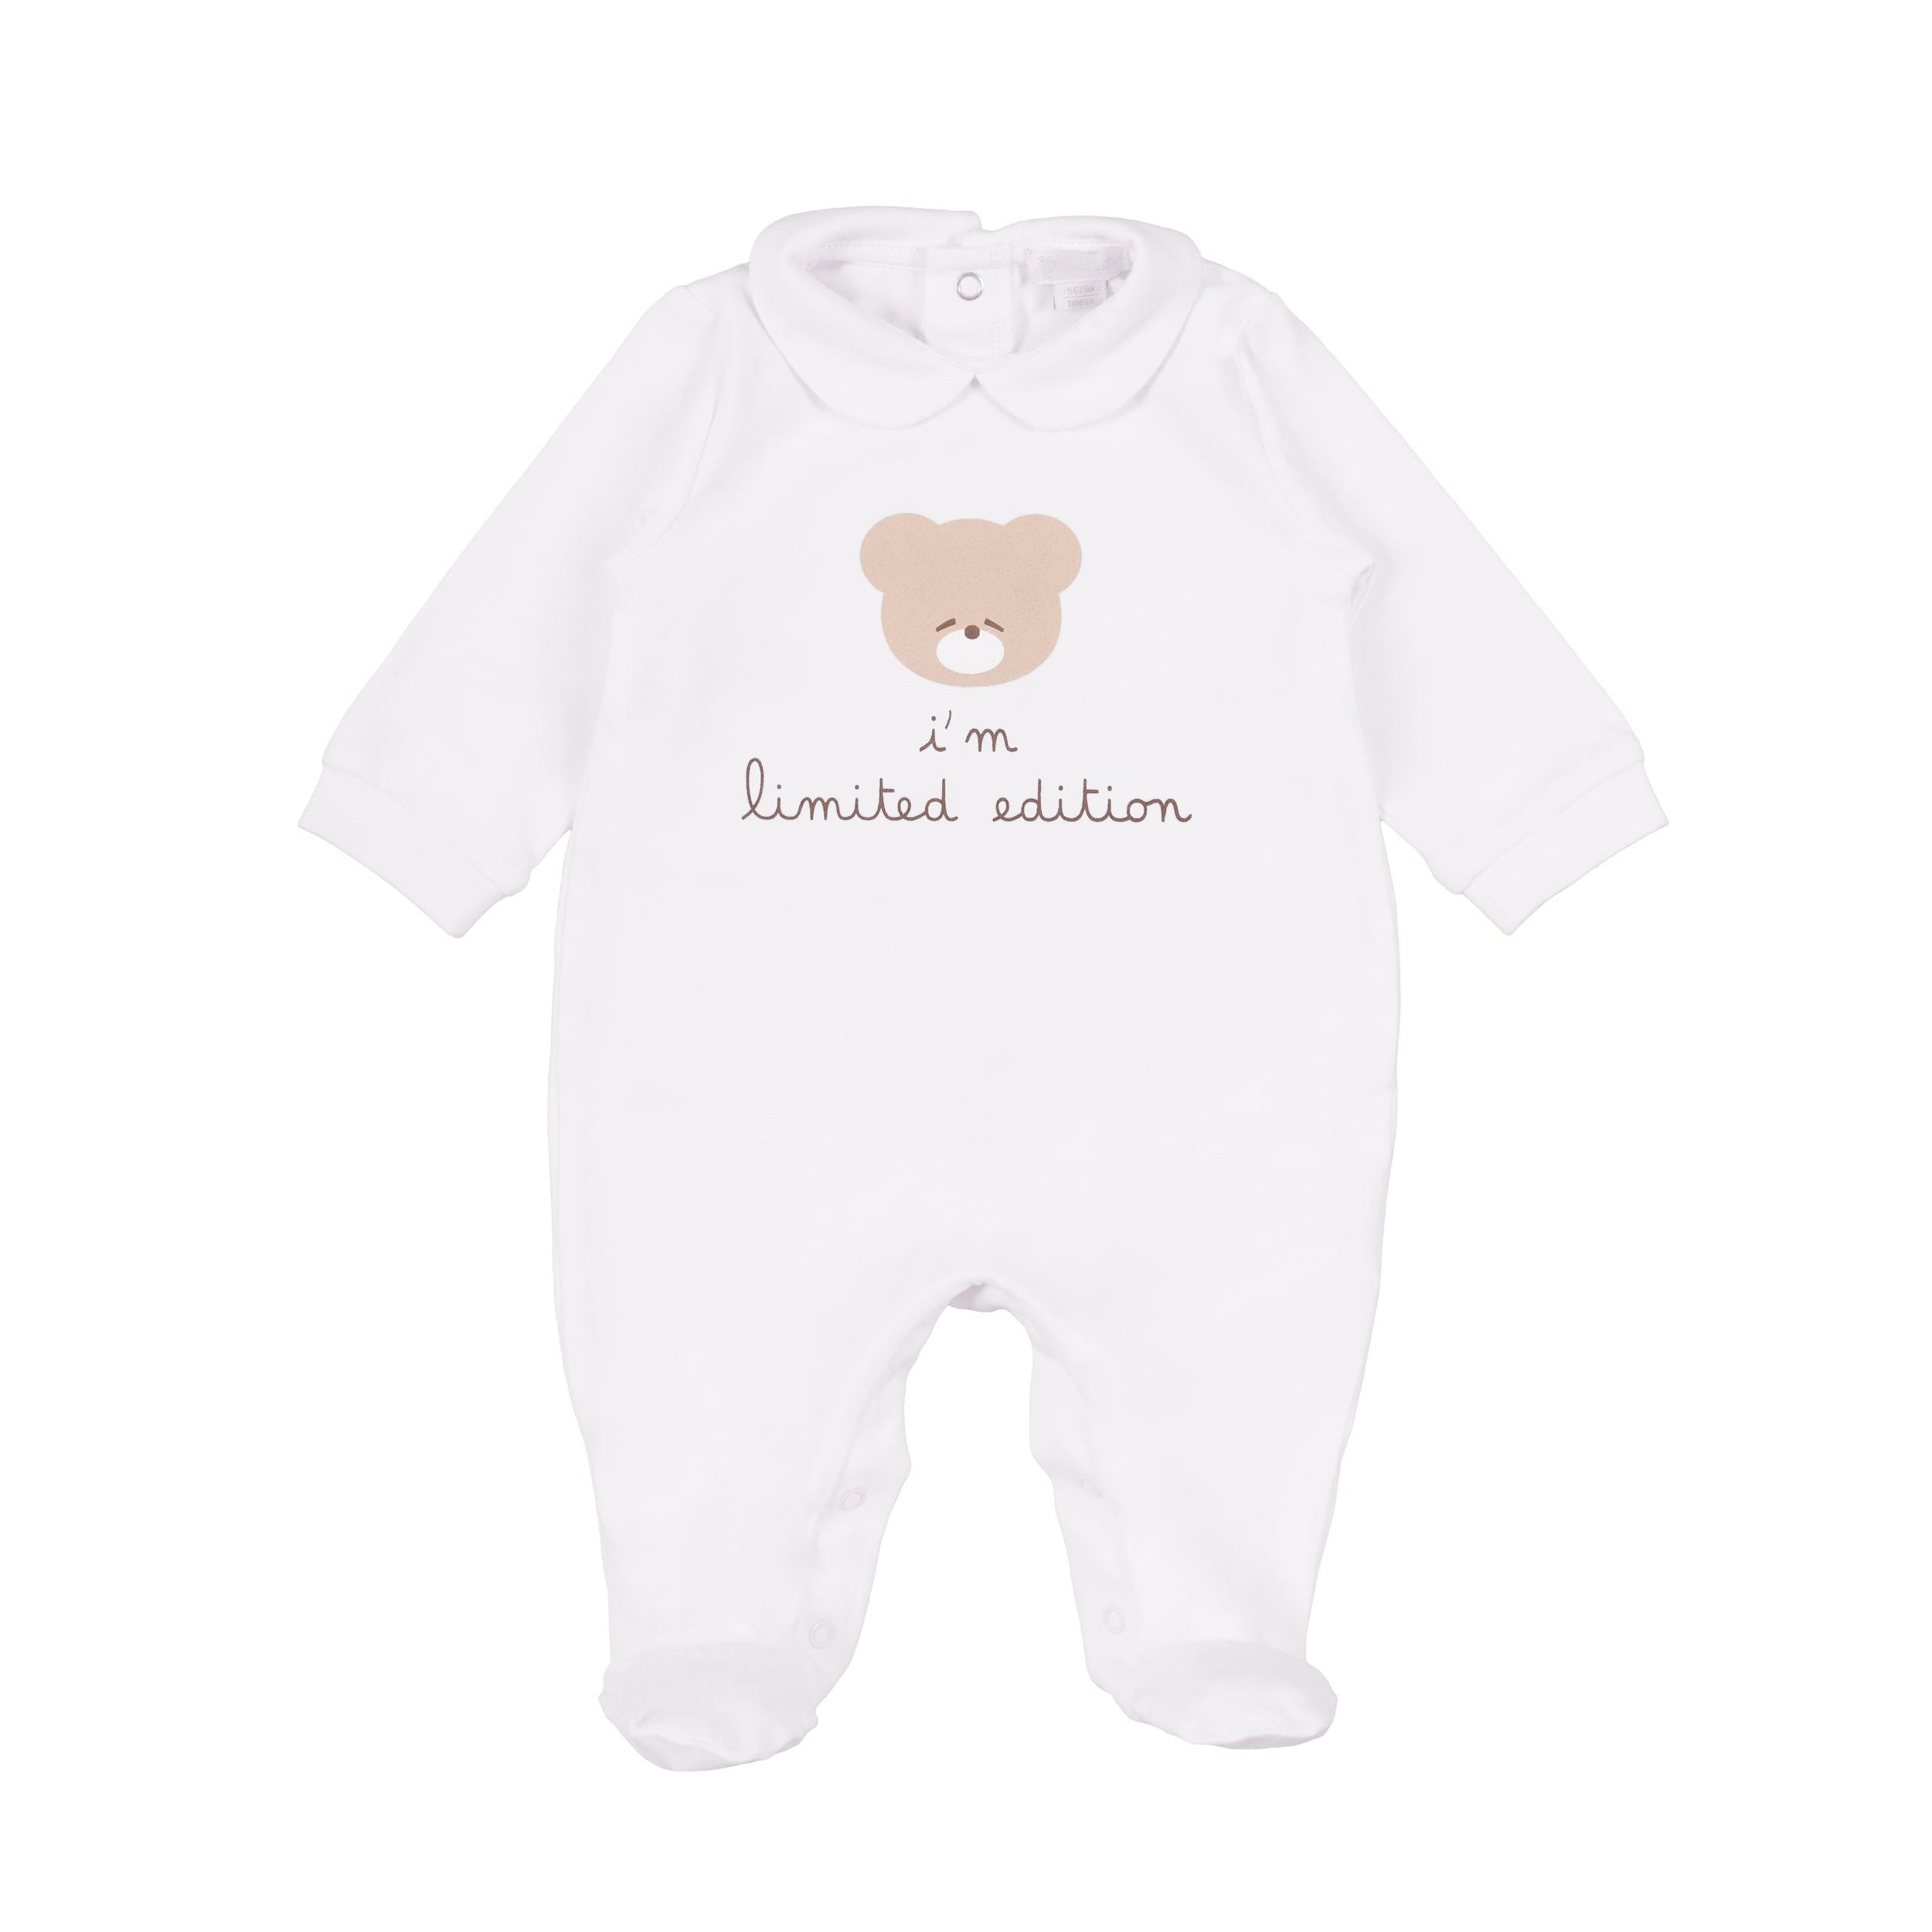 Pyjama - I'm limited Edition - 1 Mois